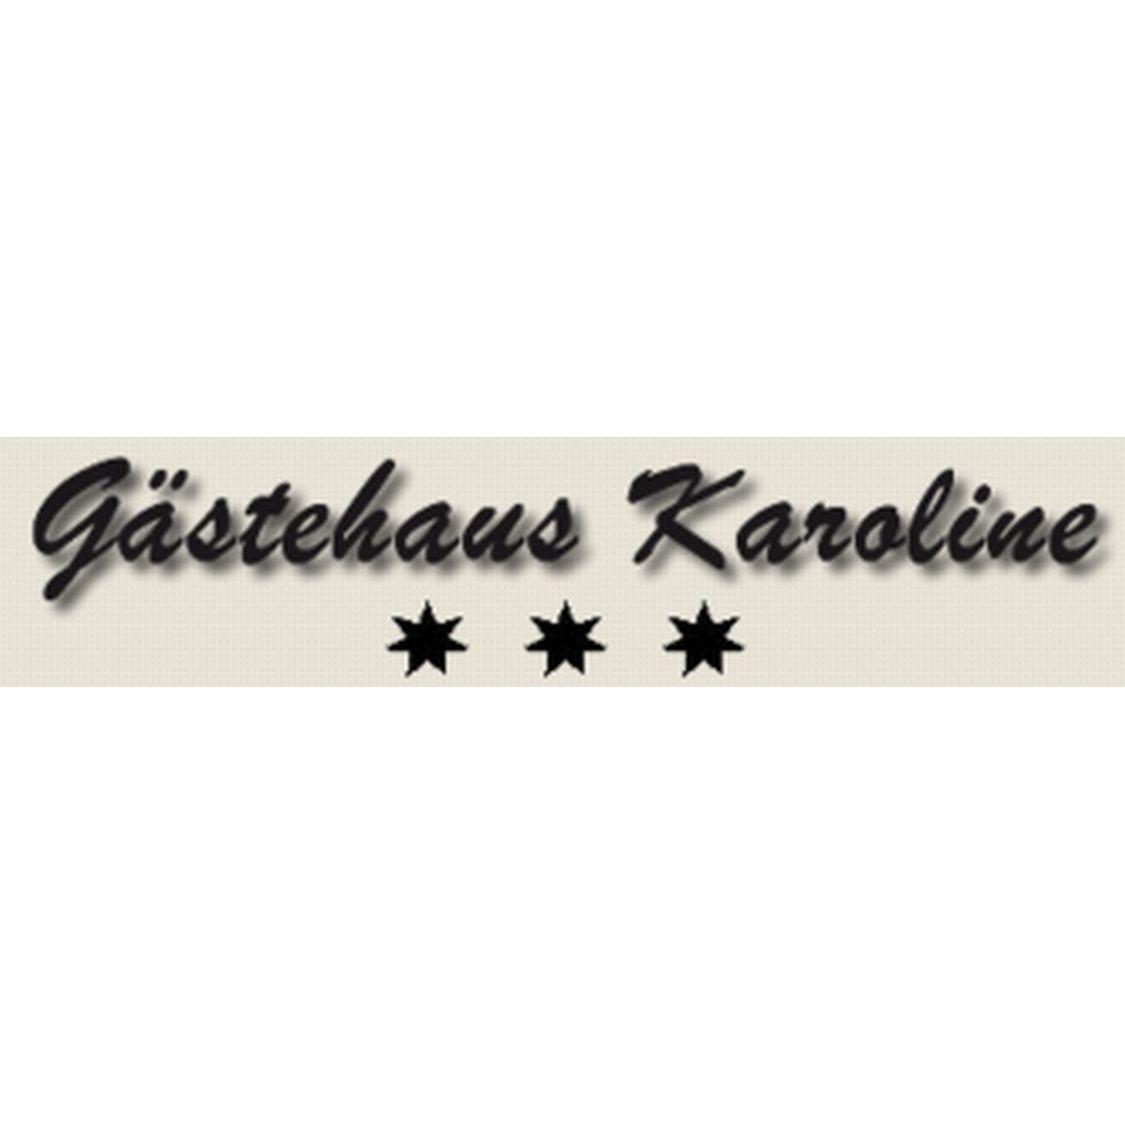 Gästehaus Karoline